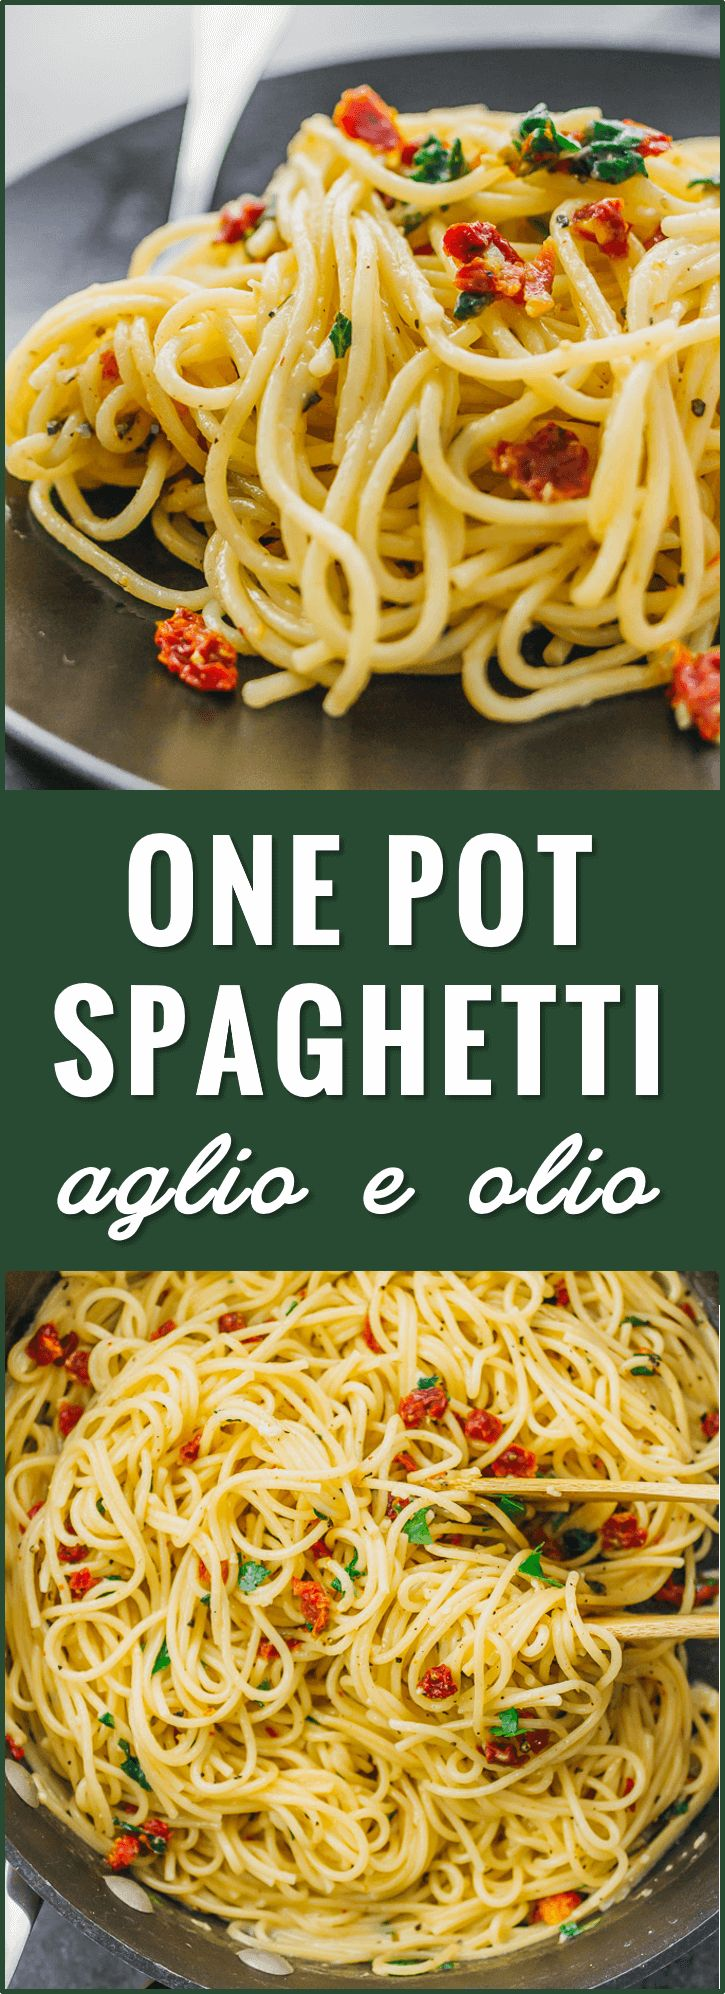 Spaghetti aglio e olio is one of my favorite simple, vegetarian pasta dishes: sp…